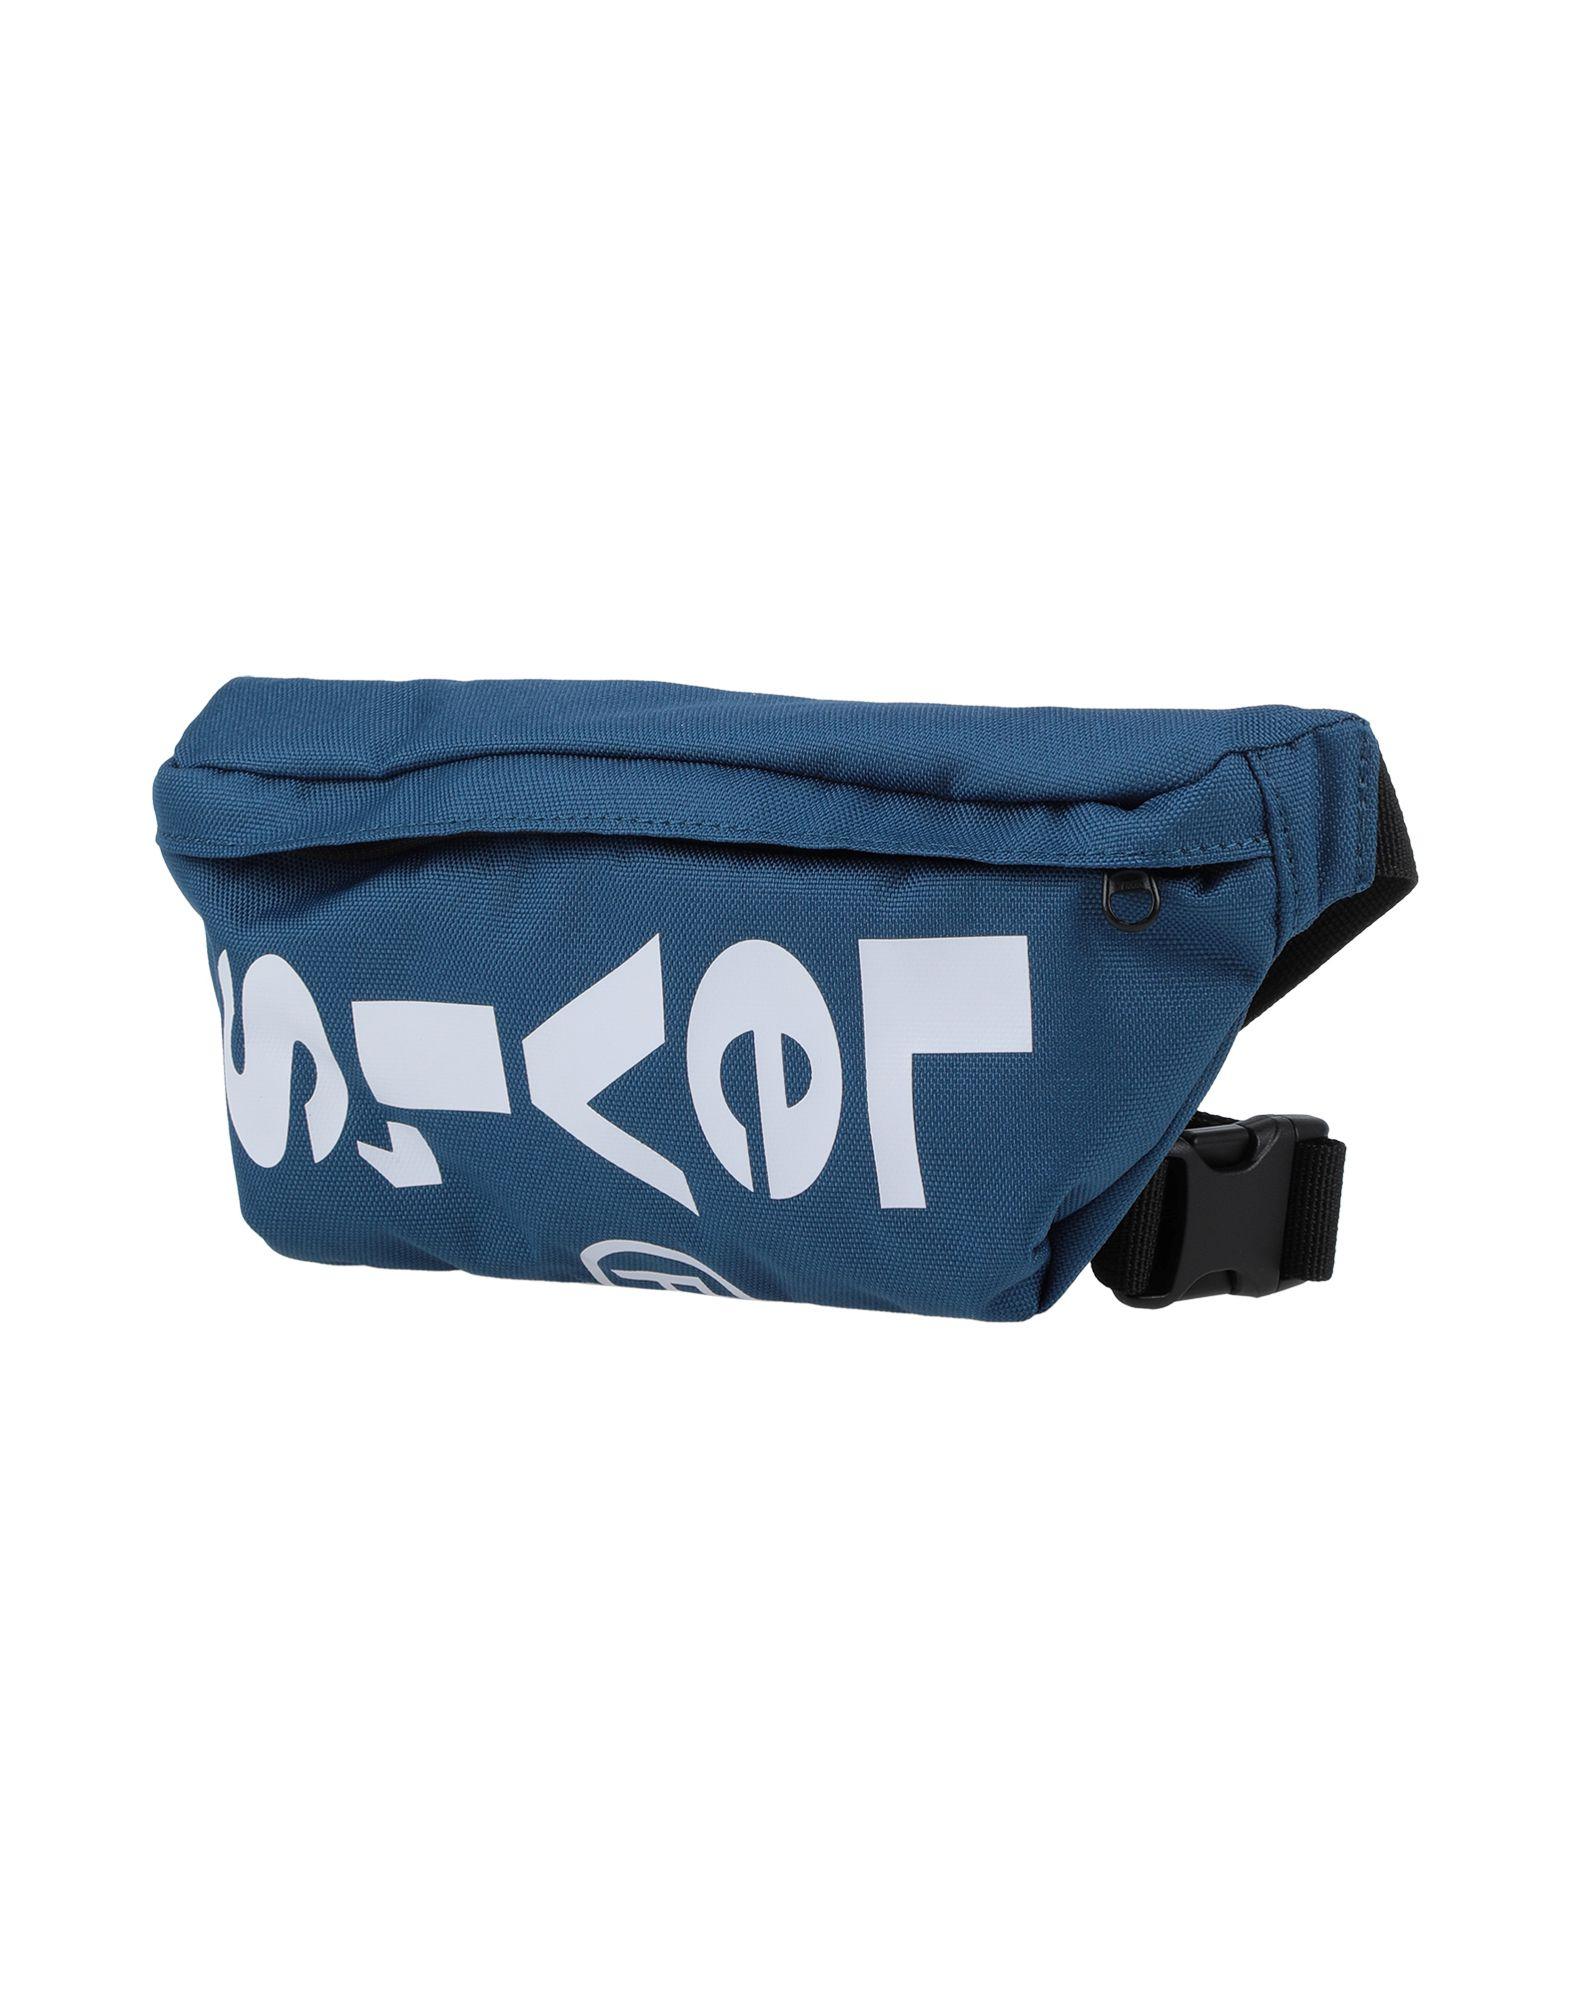 LEVI' S Рюкзаки и сумки на пояс original 150w joyetech cuboid kit with cubis atomier 3 5ml tank joyetech cuboid 150w tc box mod and cubis tank vaping kit